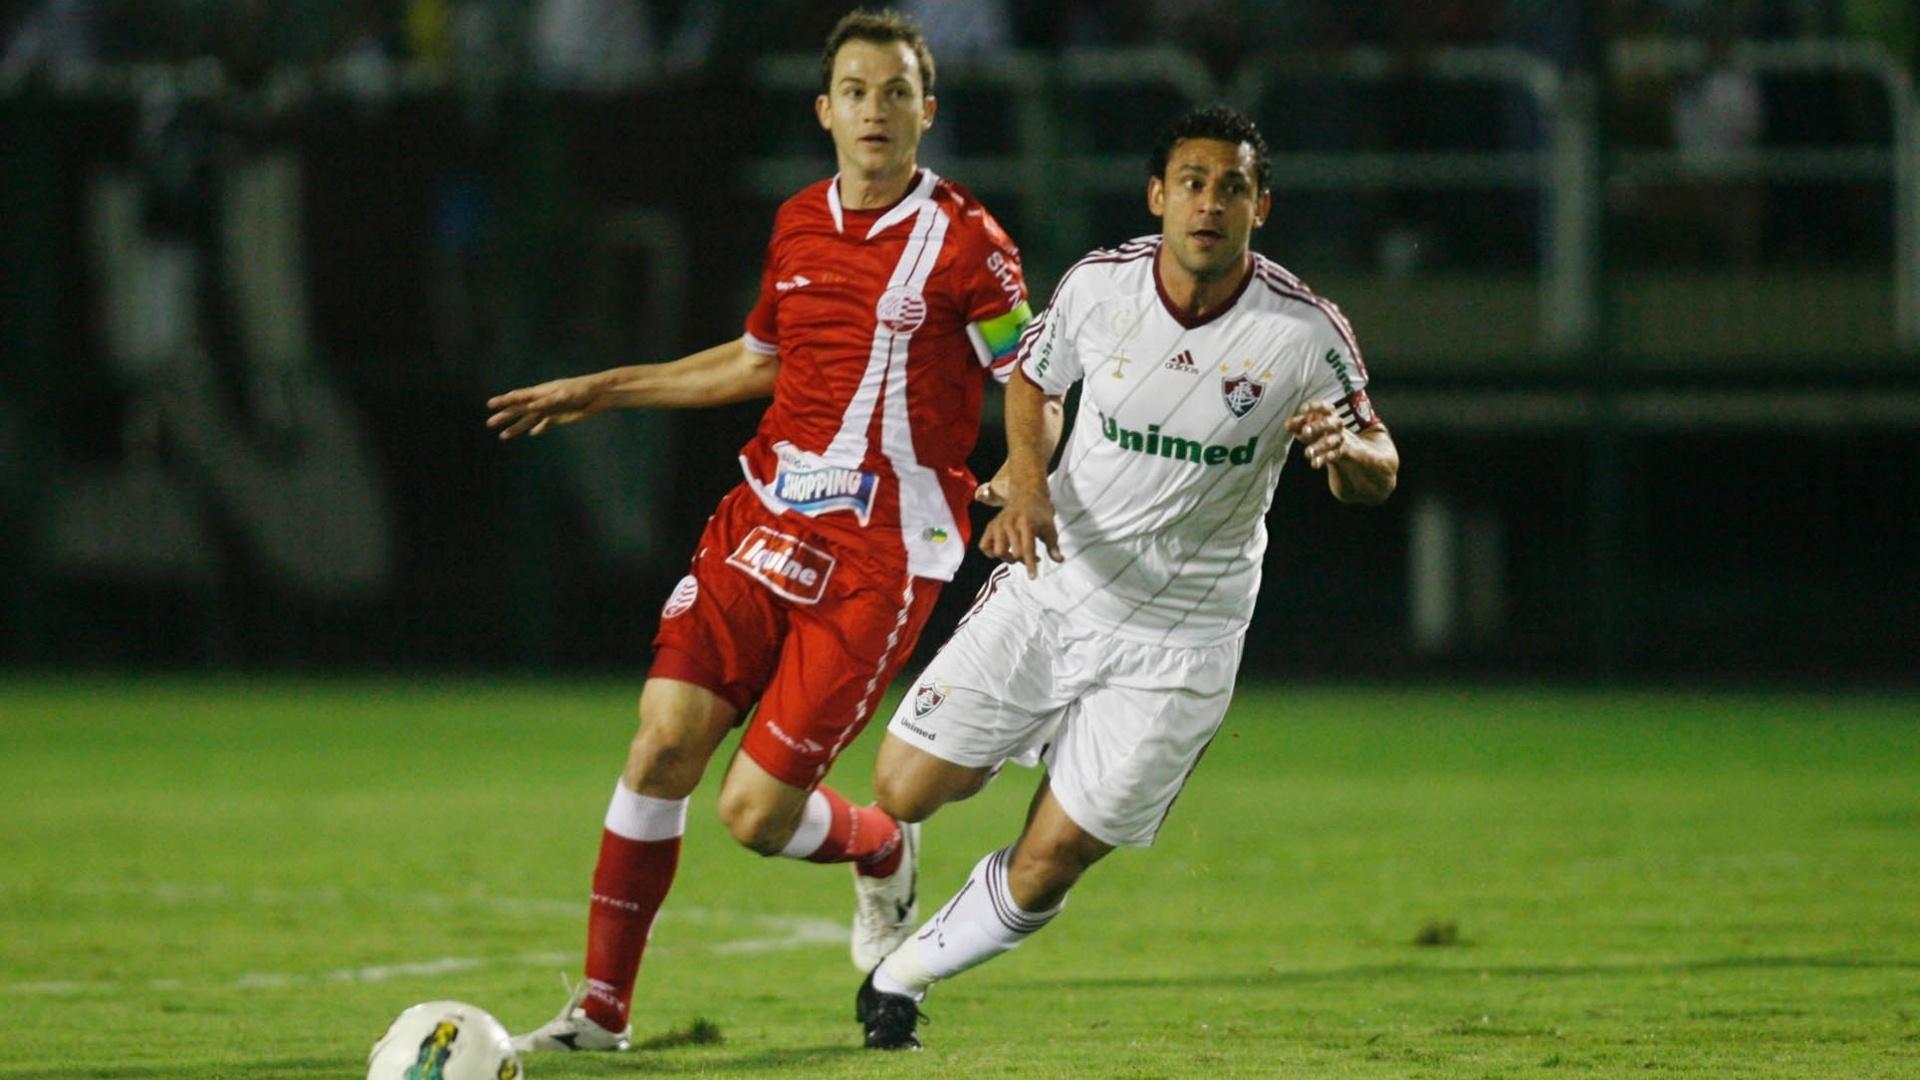 Fred é seguido de perto por Martinez na partida entre Fluminense e Náutico